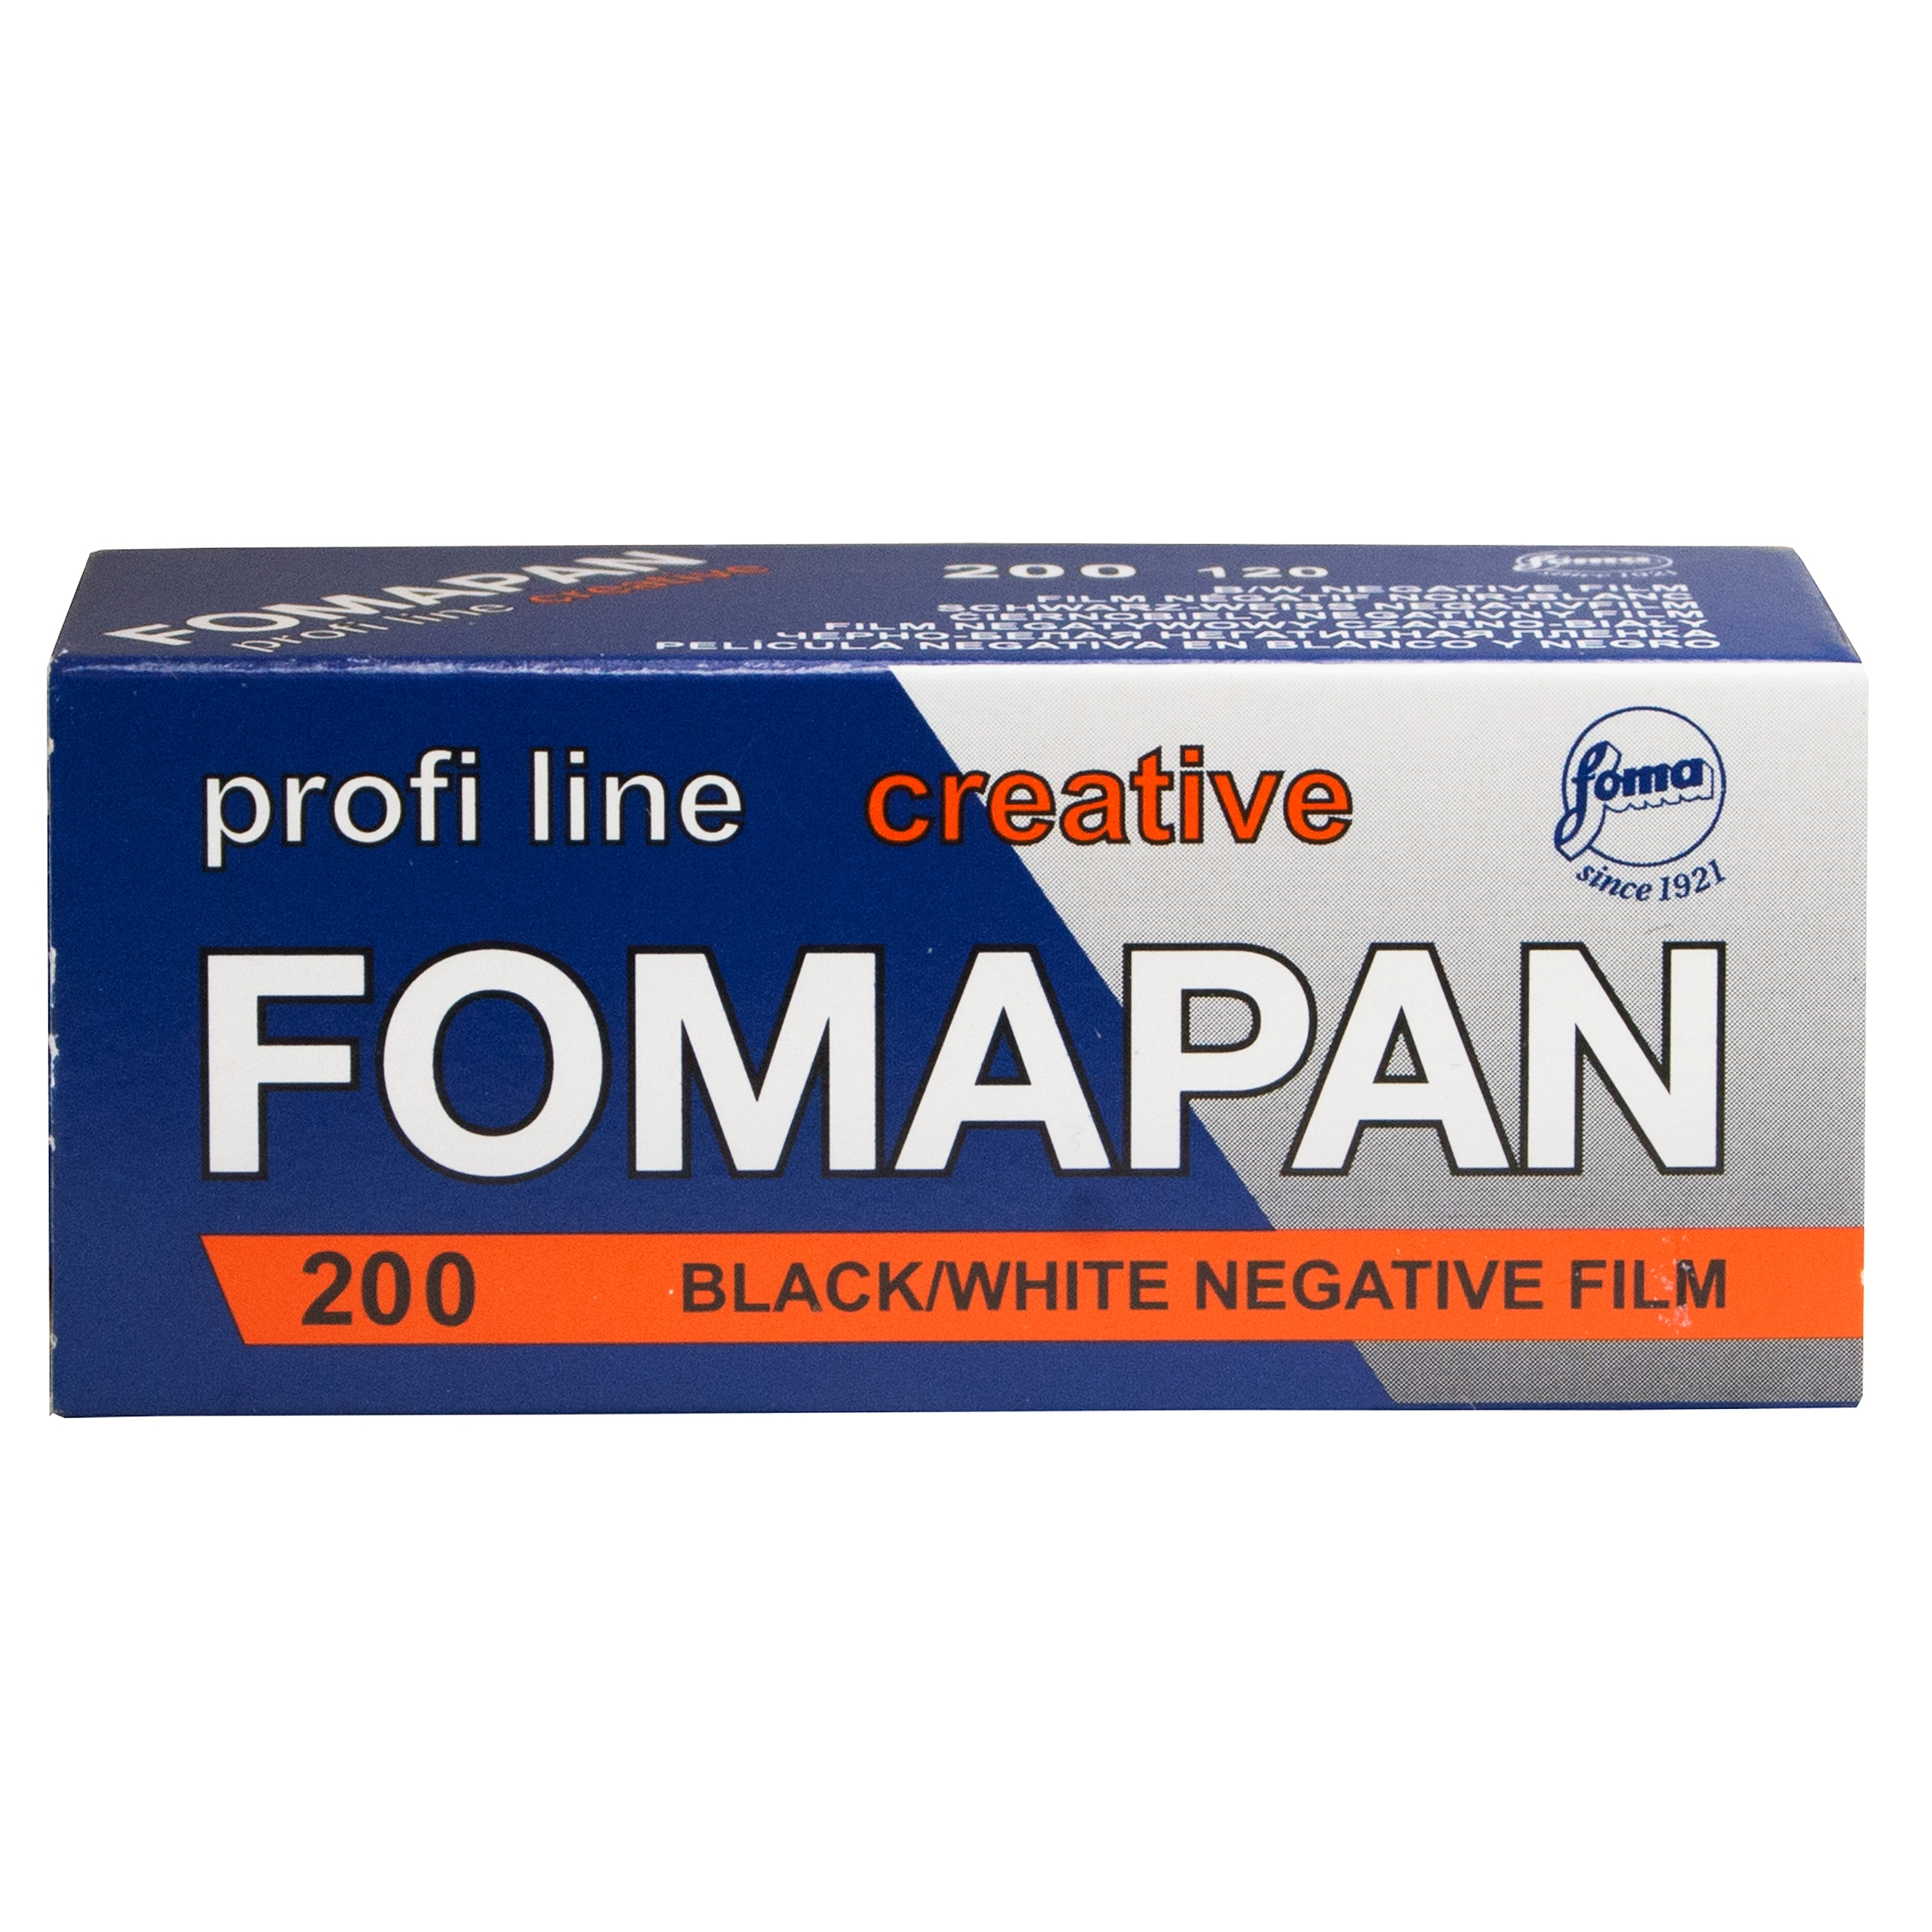 FOMATAN 200/120